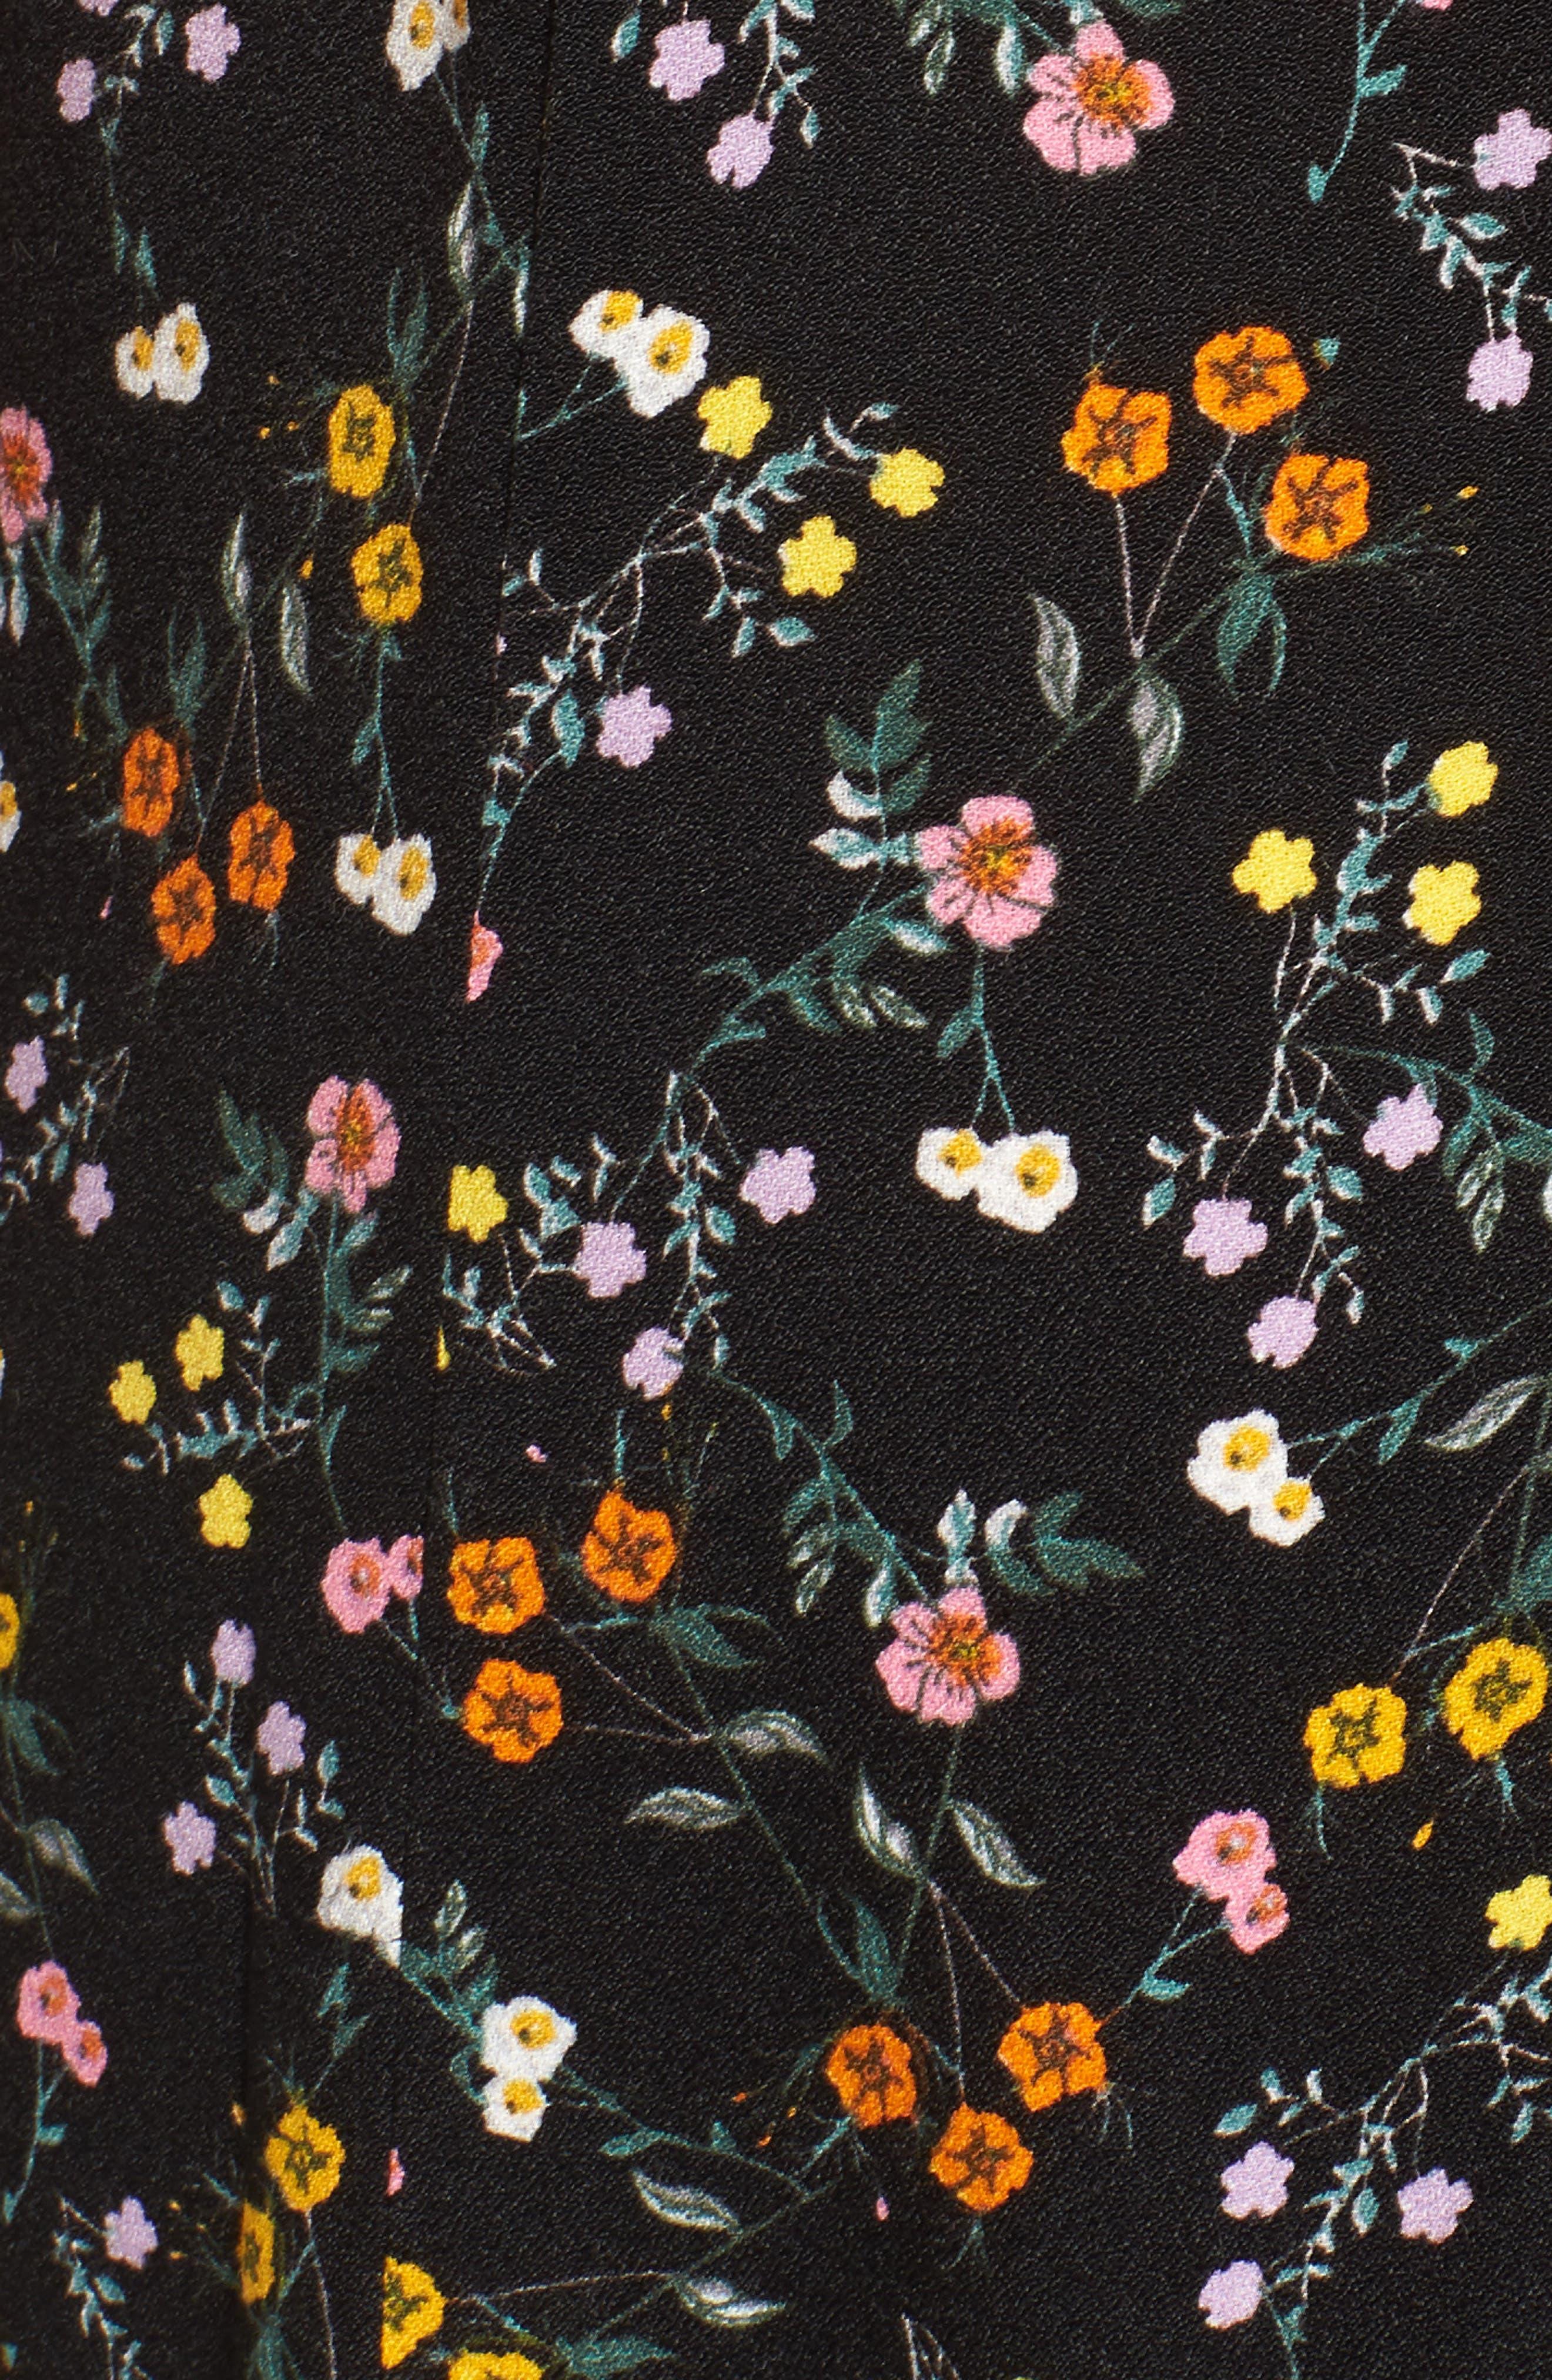 Kiki Ruffle Maxi Dress,                             Alternate thumbnail 6, color,                             Noir Petite Fleur